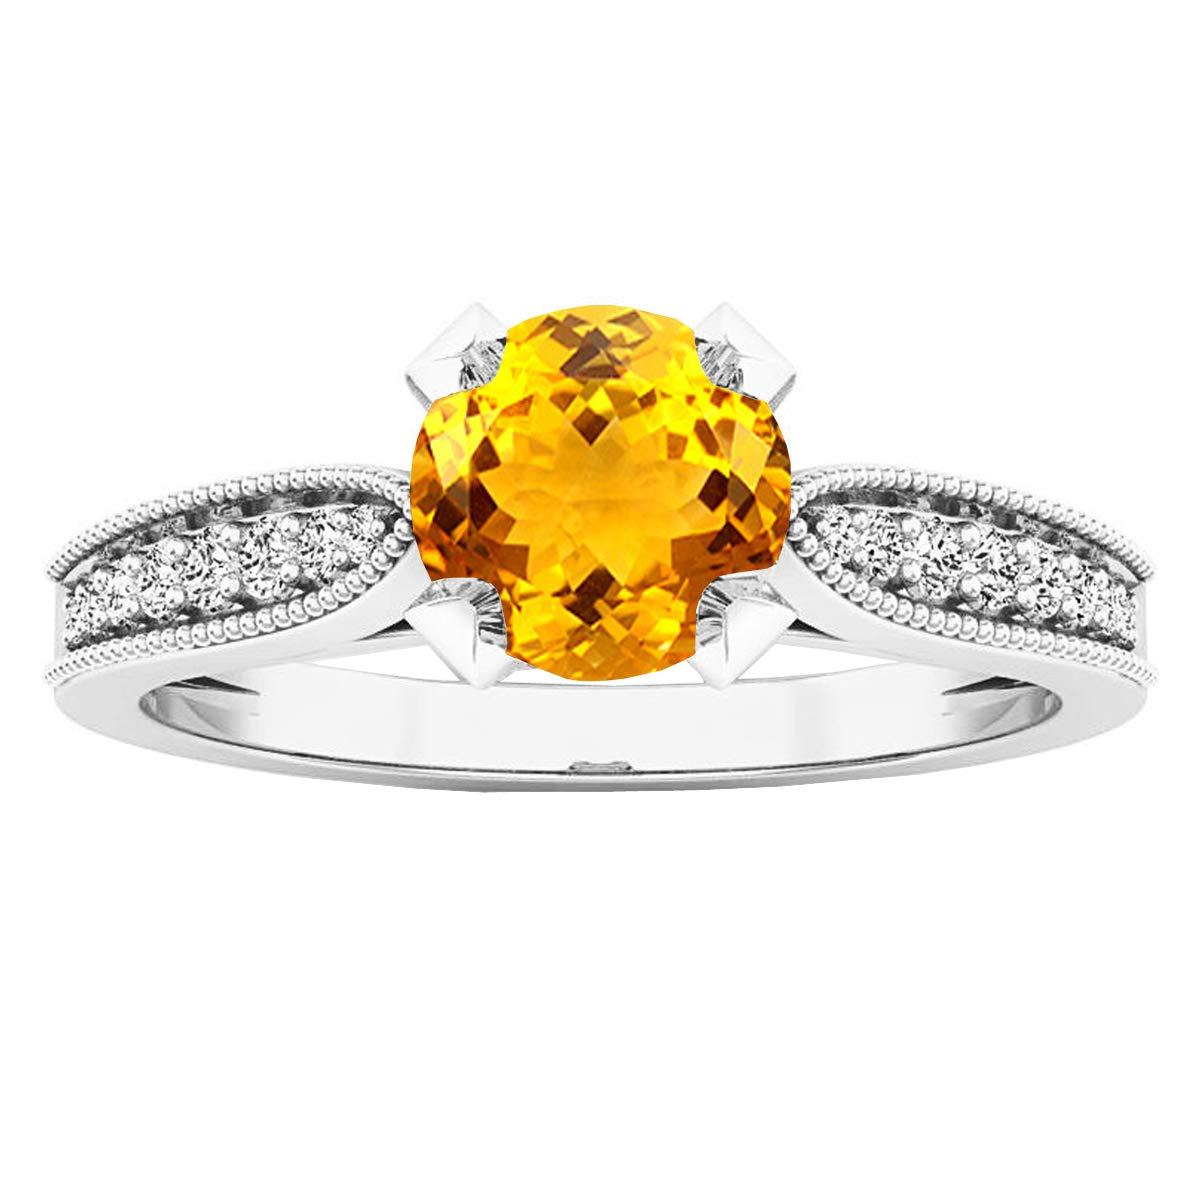 Dazzlingrock Collection 6 MM Round Gemstone /& Diamond Ladies Bridal Engagement Ring Sterling Silver